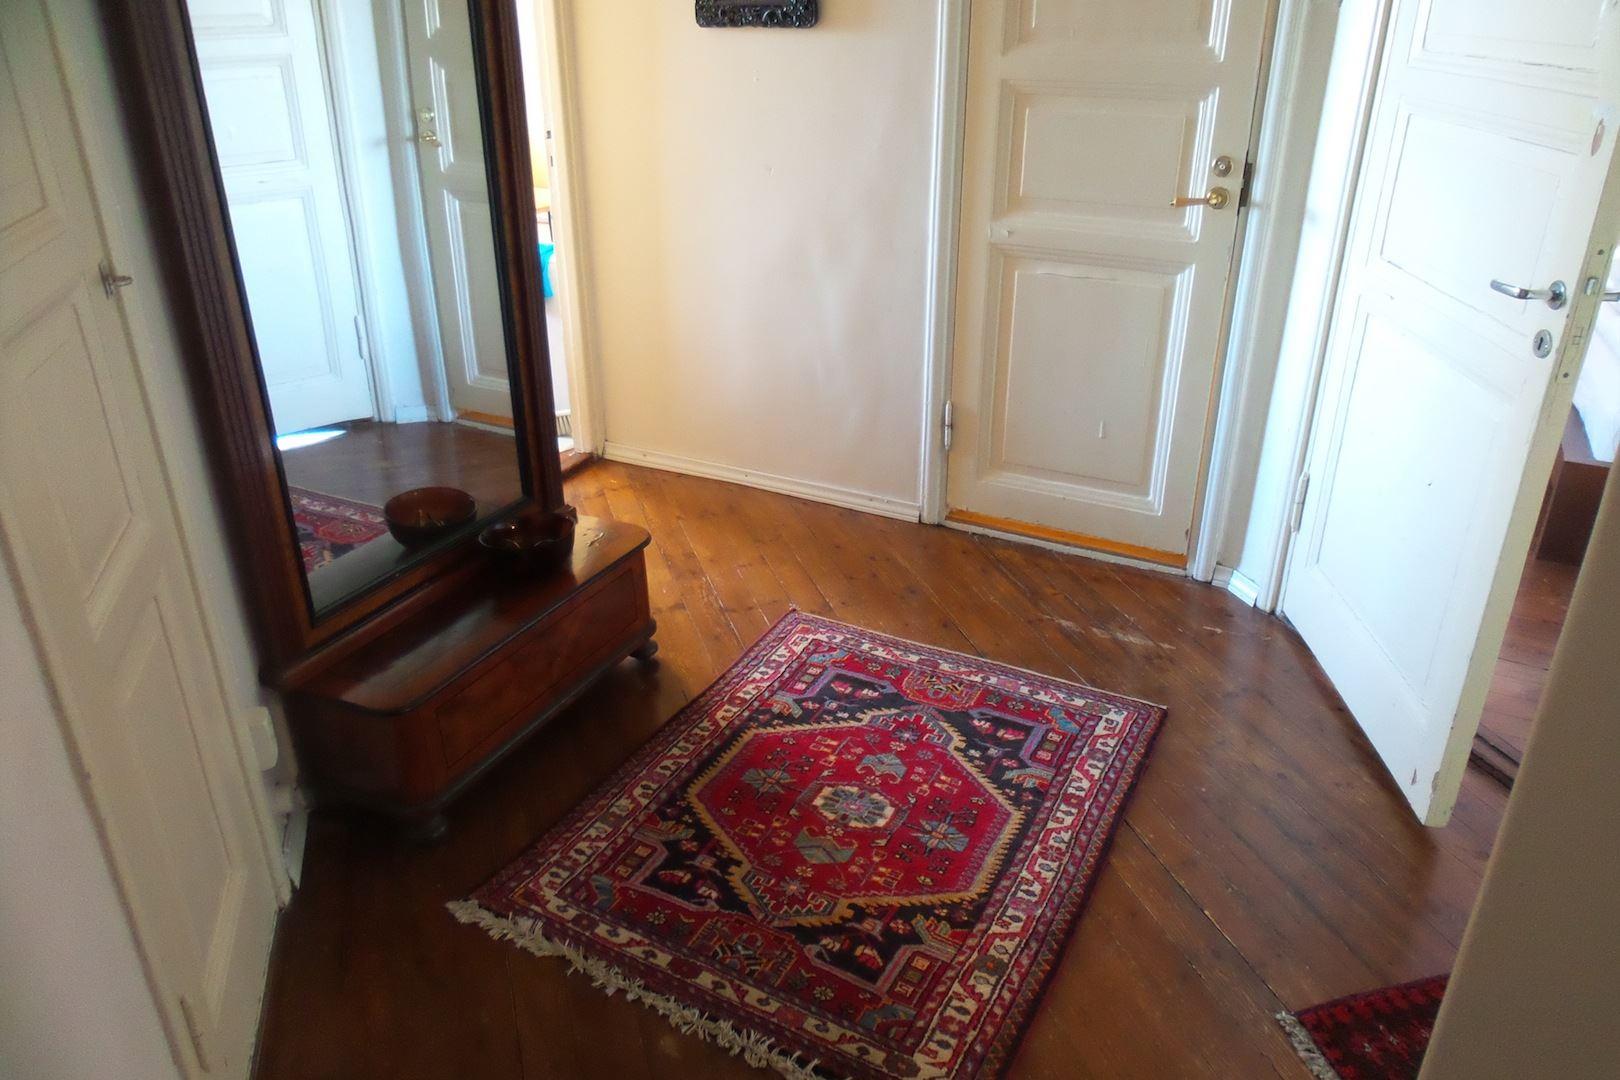 aulasta lähtee 4 ovea: keittiö, makkari, vessa ja olohuone